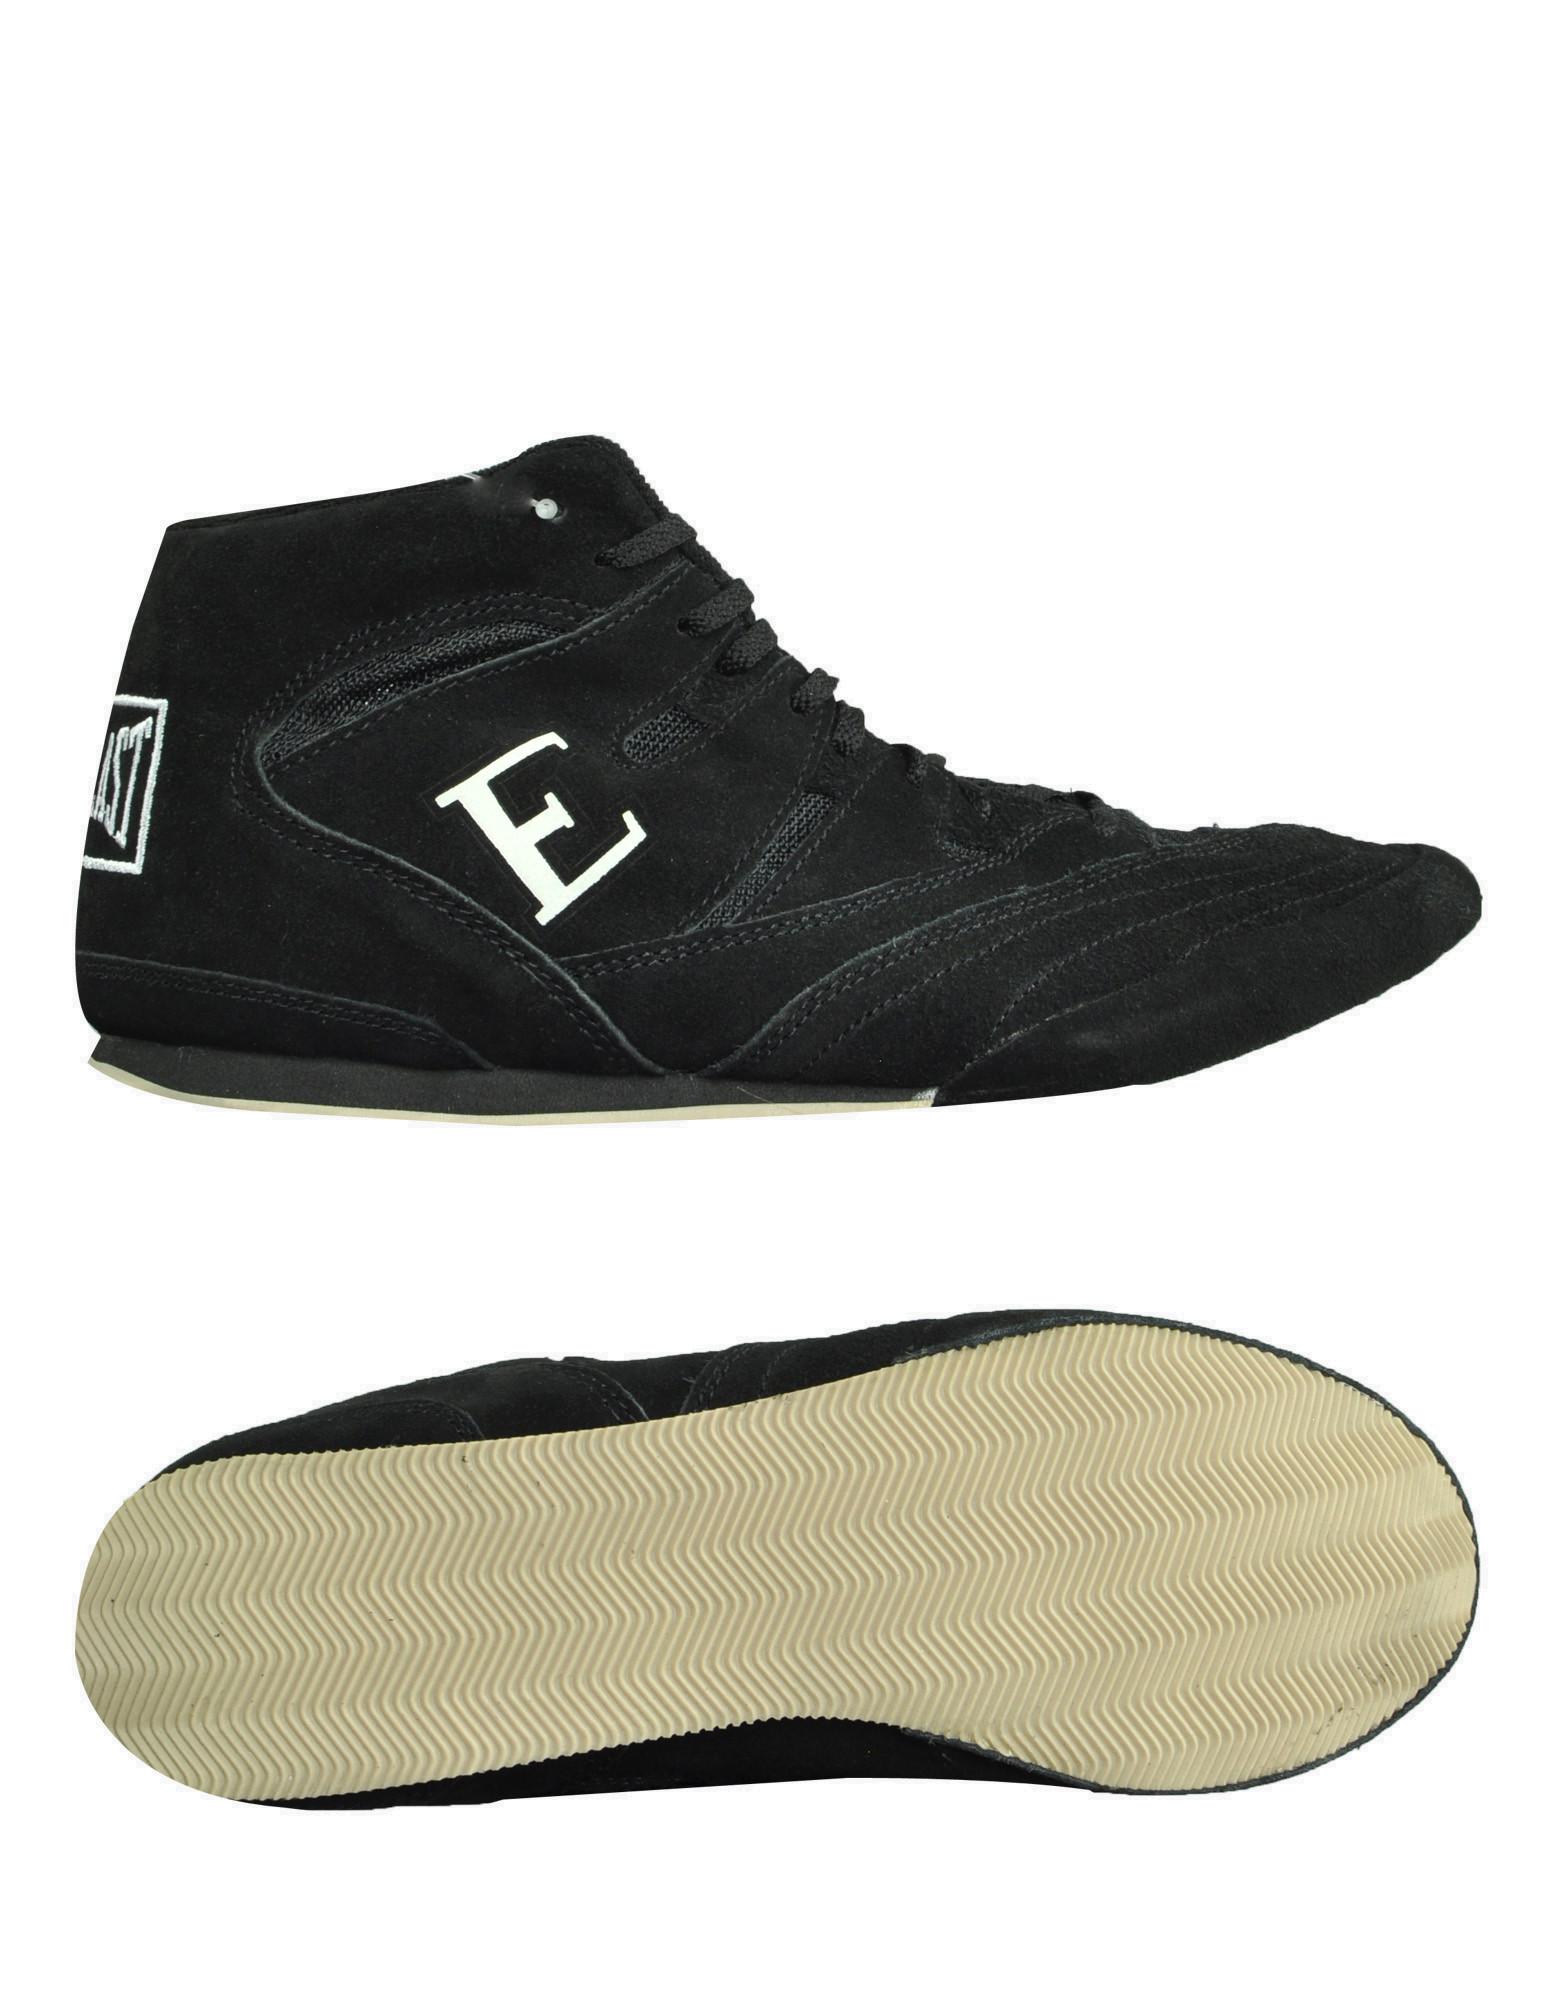 Everlast Lo Top Boxing Shoe Black